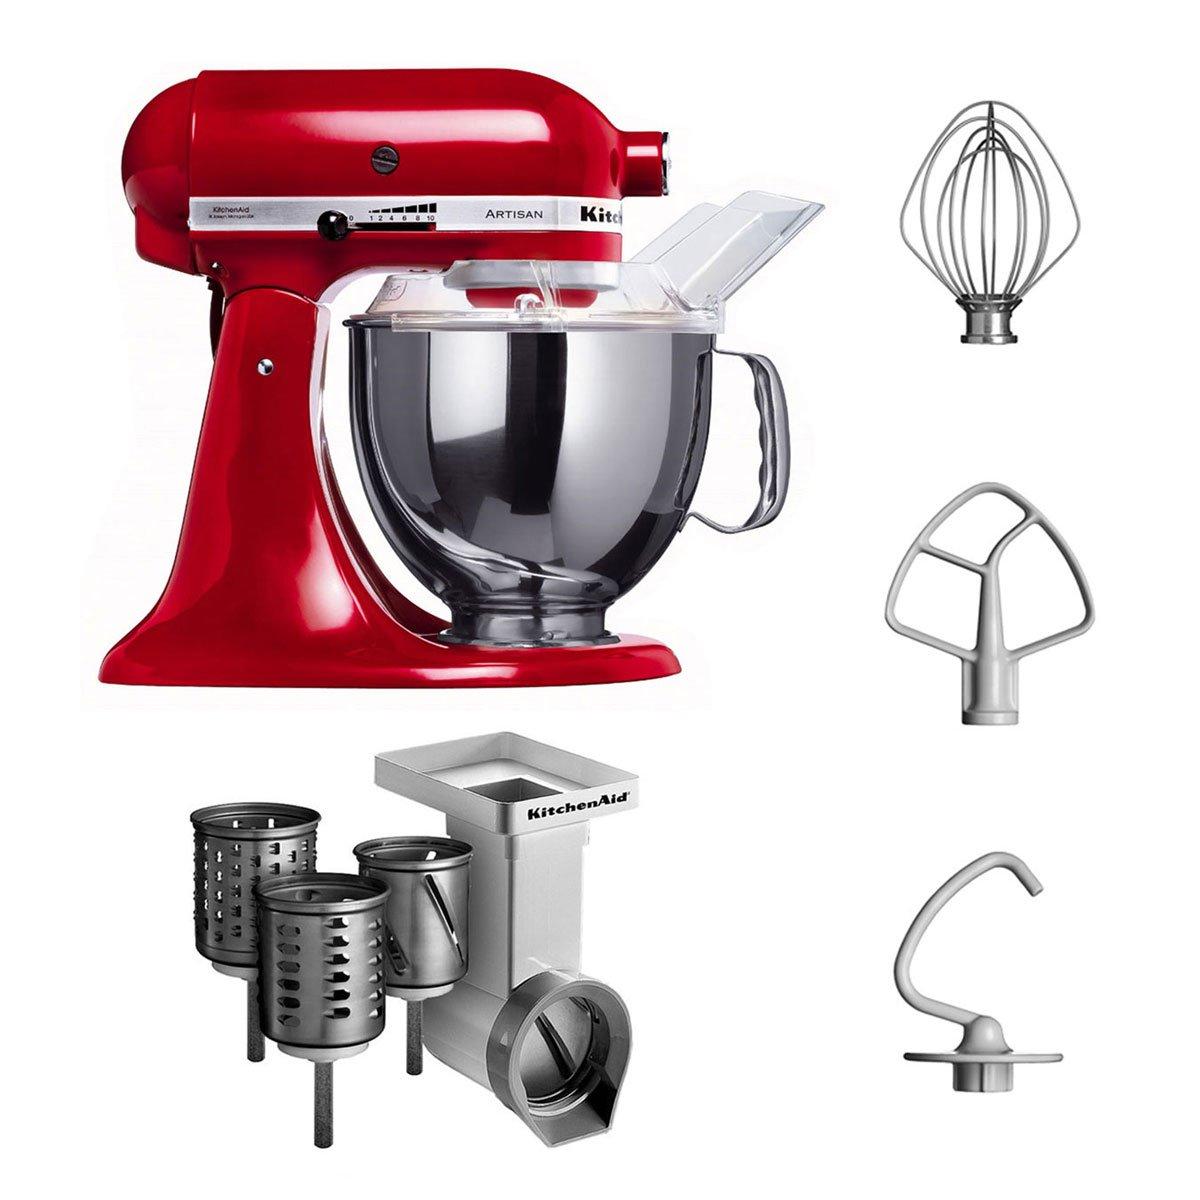 Amazon.de: KitchenAid 5KSM150PSECA4 Küchenmaschine mit kippbarem ...